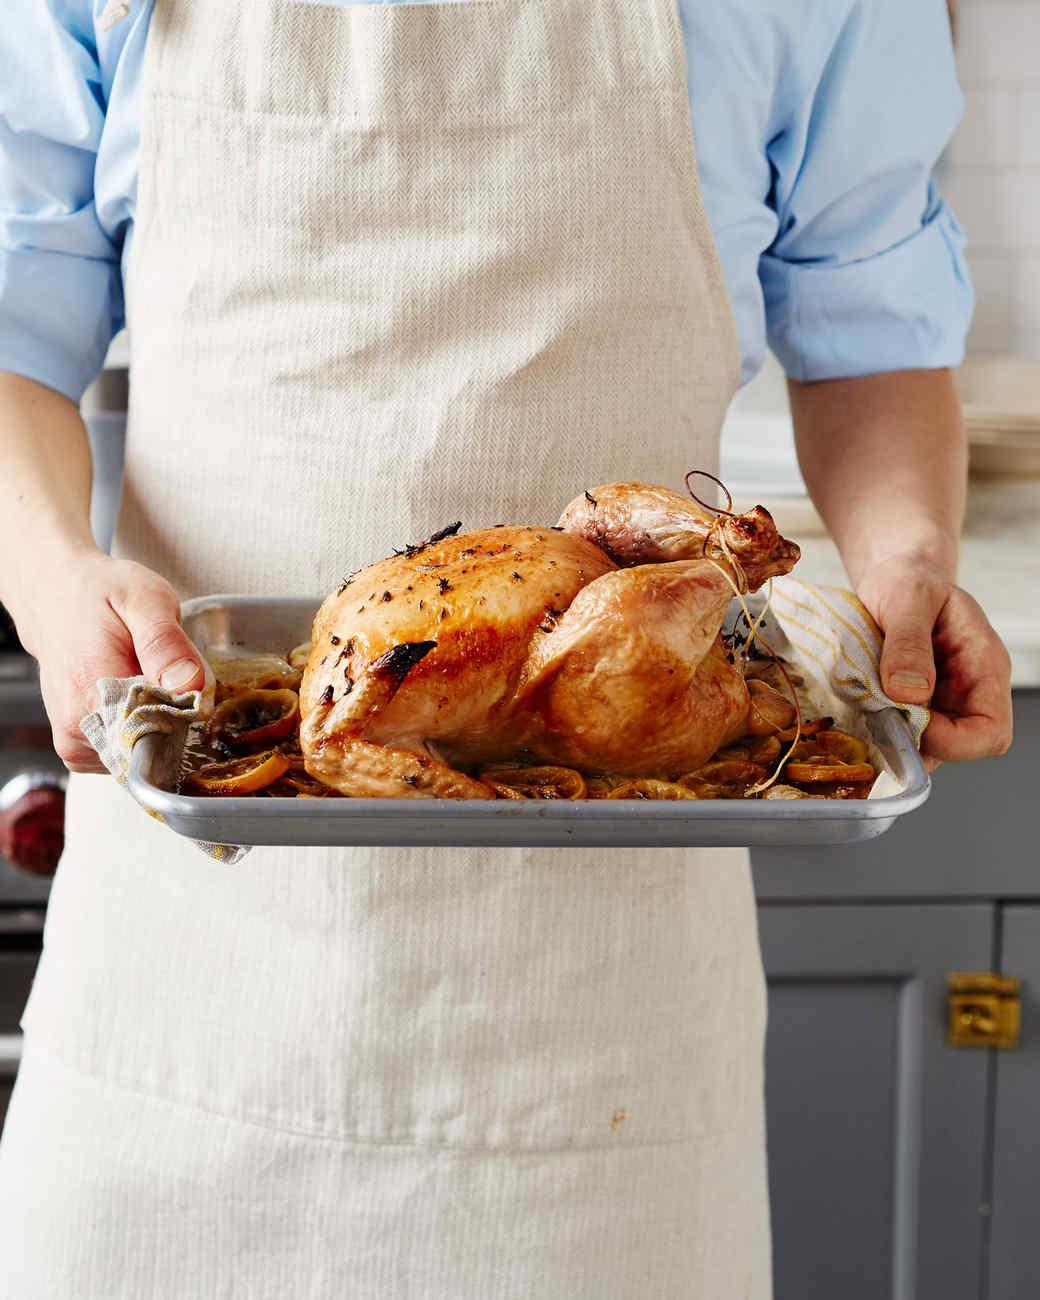 man-holding-roasted-chicken-opener-2-158-d113040.jpg